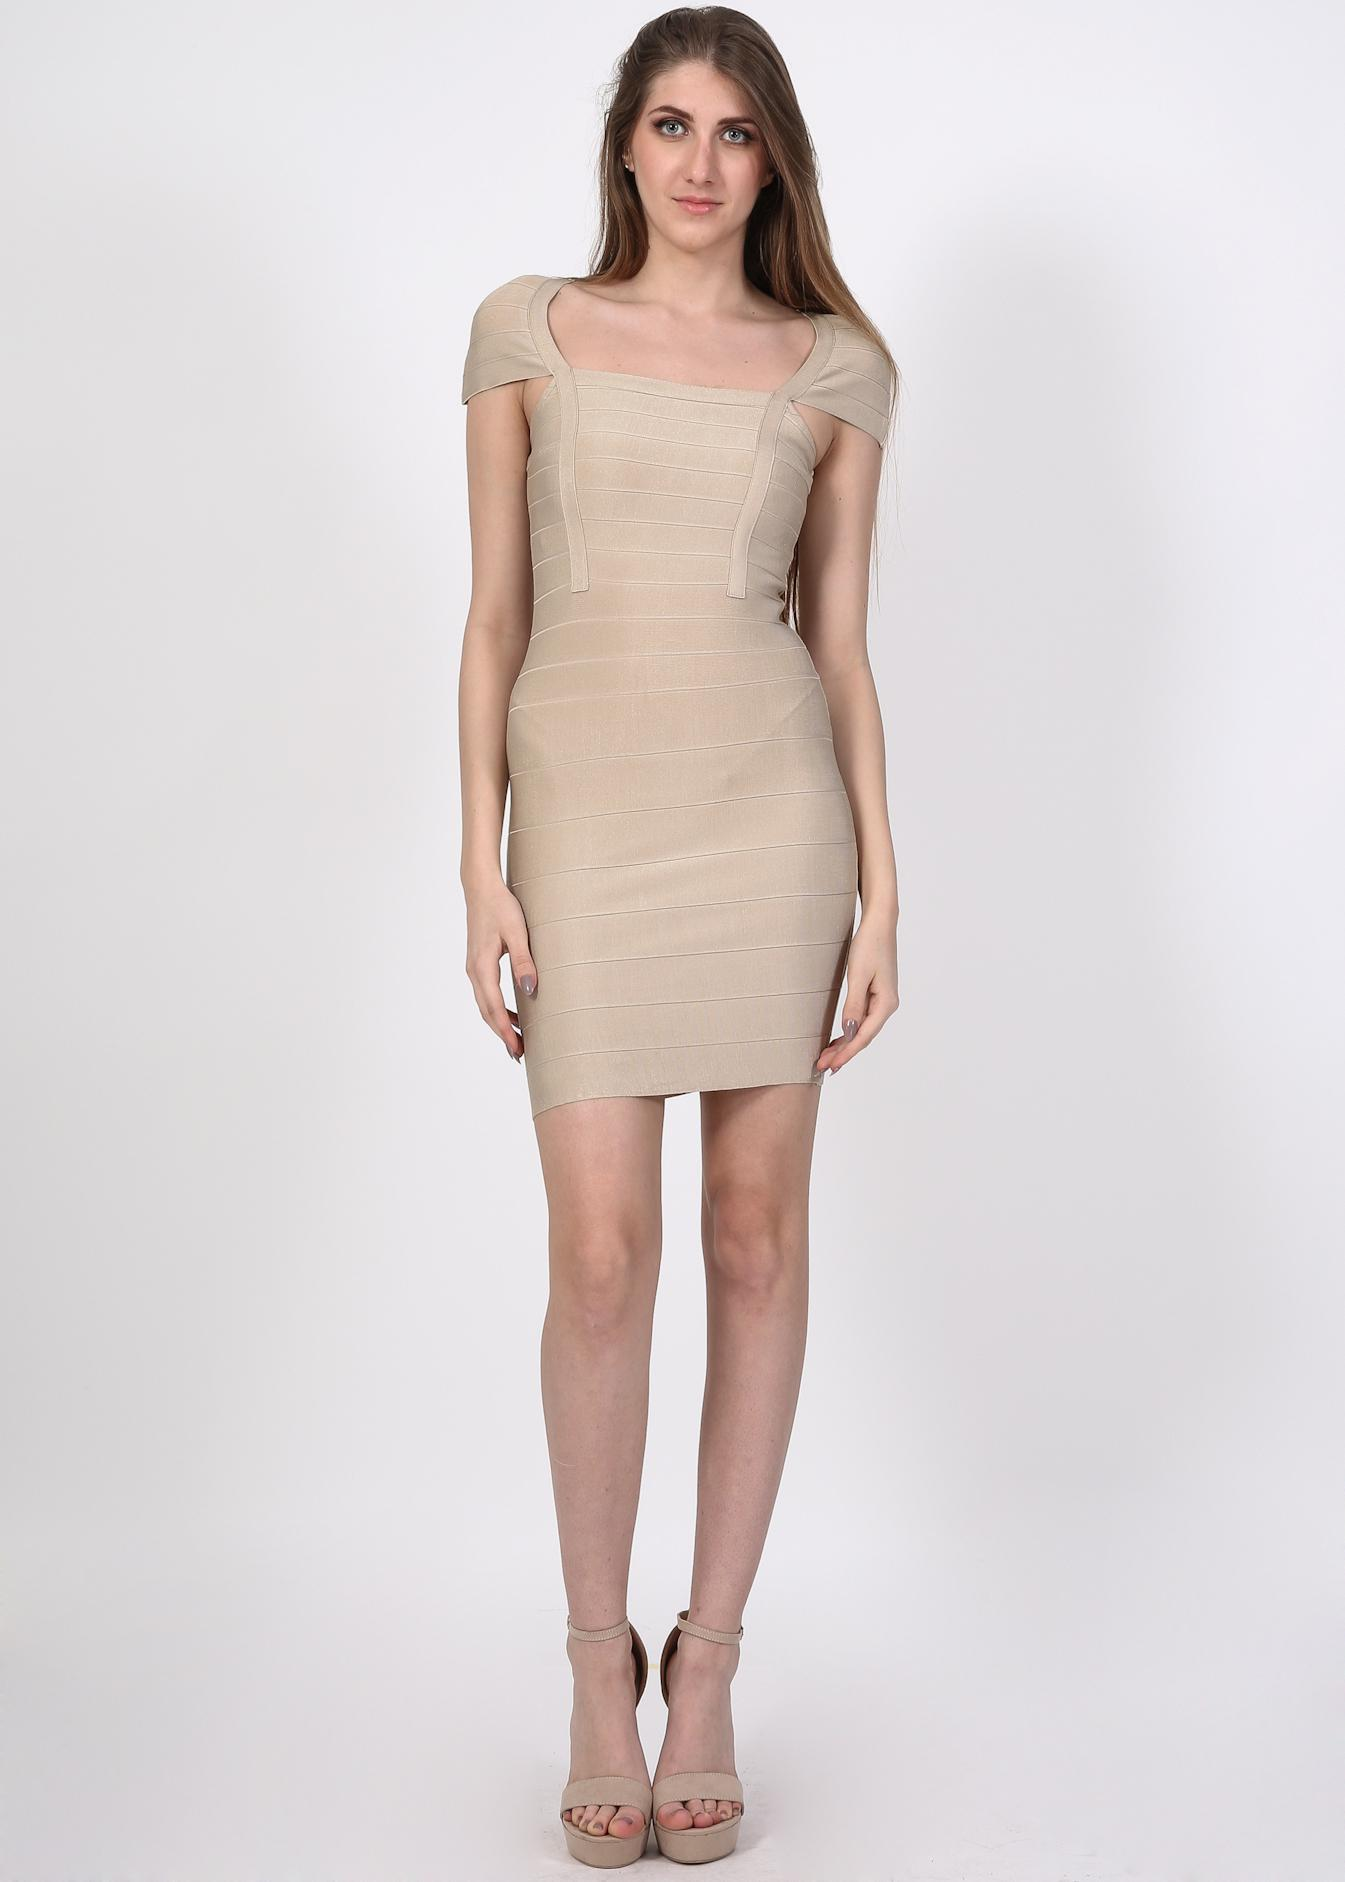 Kim bandage bodycon φόρεμα, μπεζ ρούχα